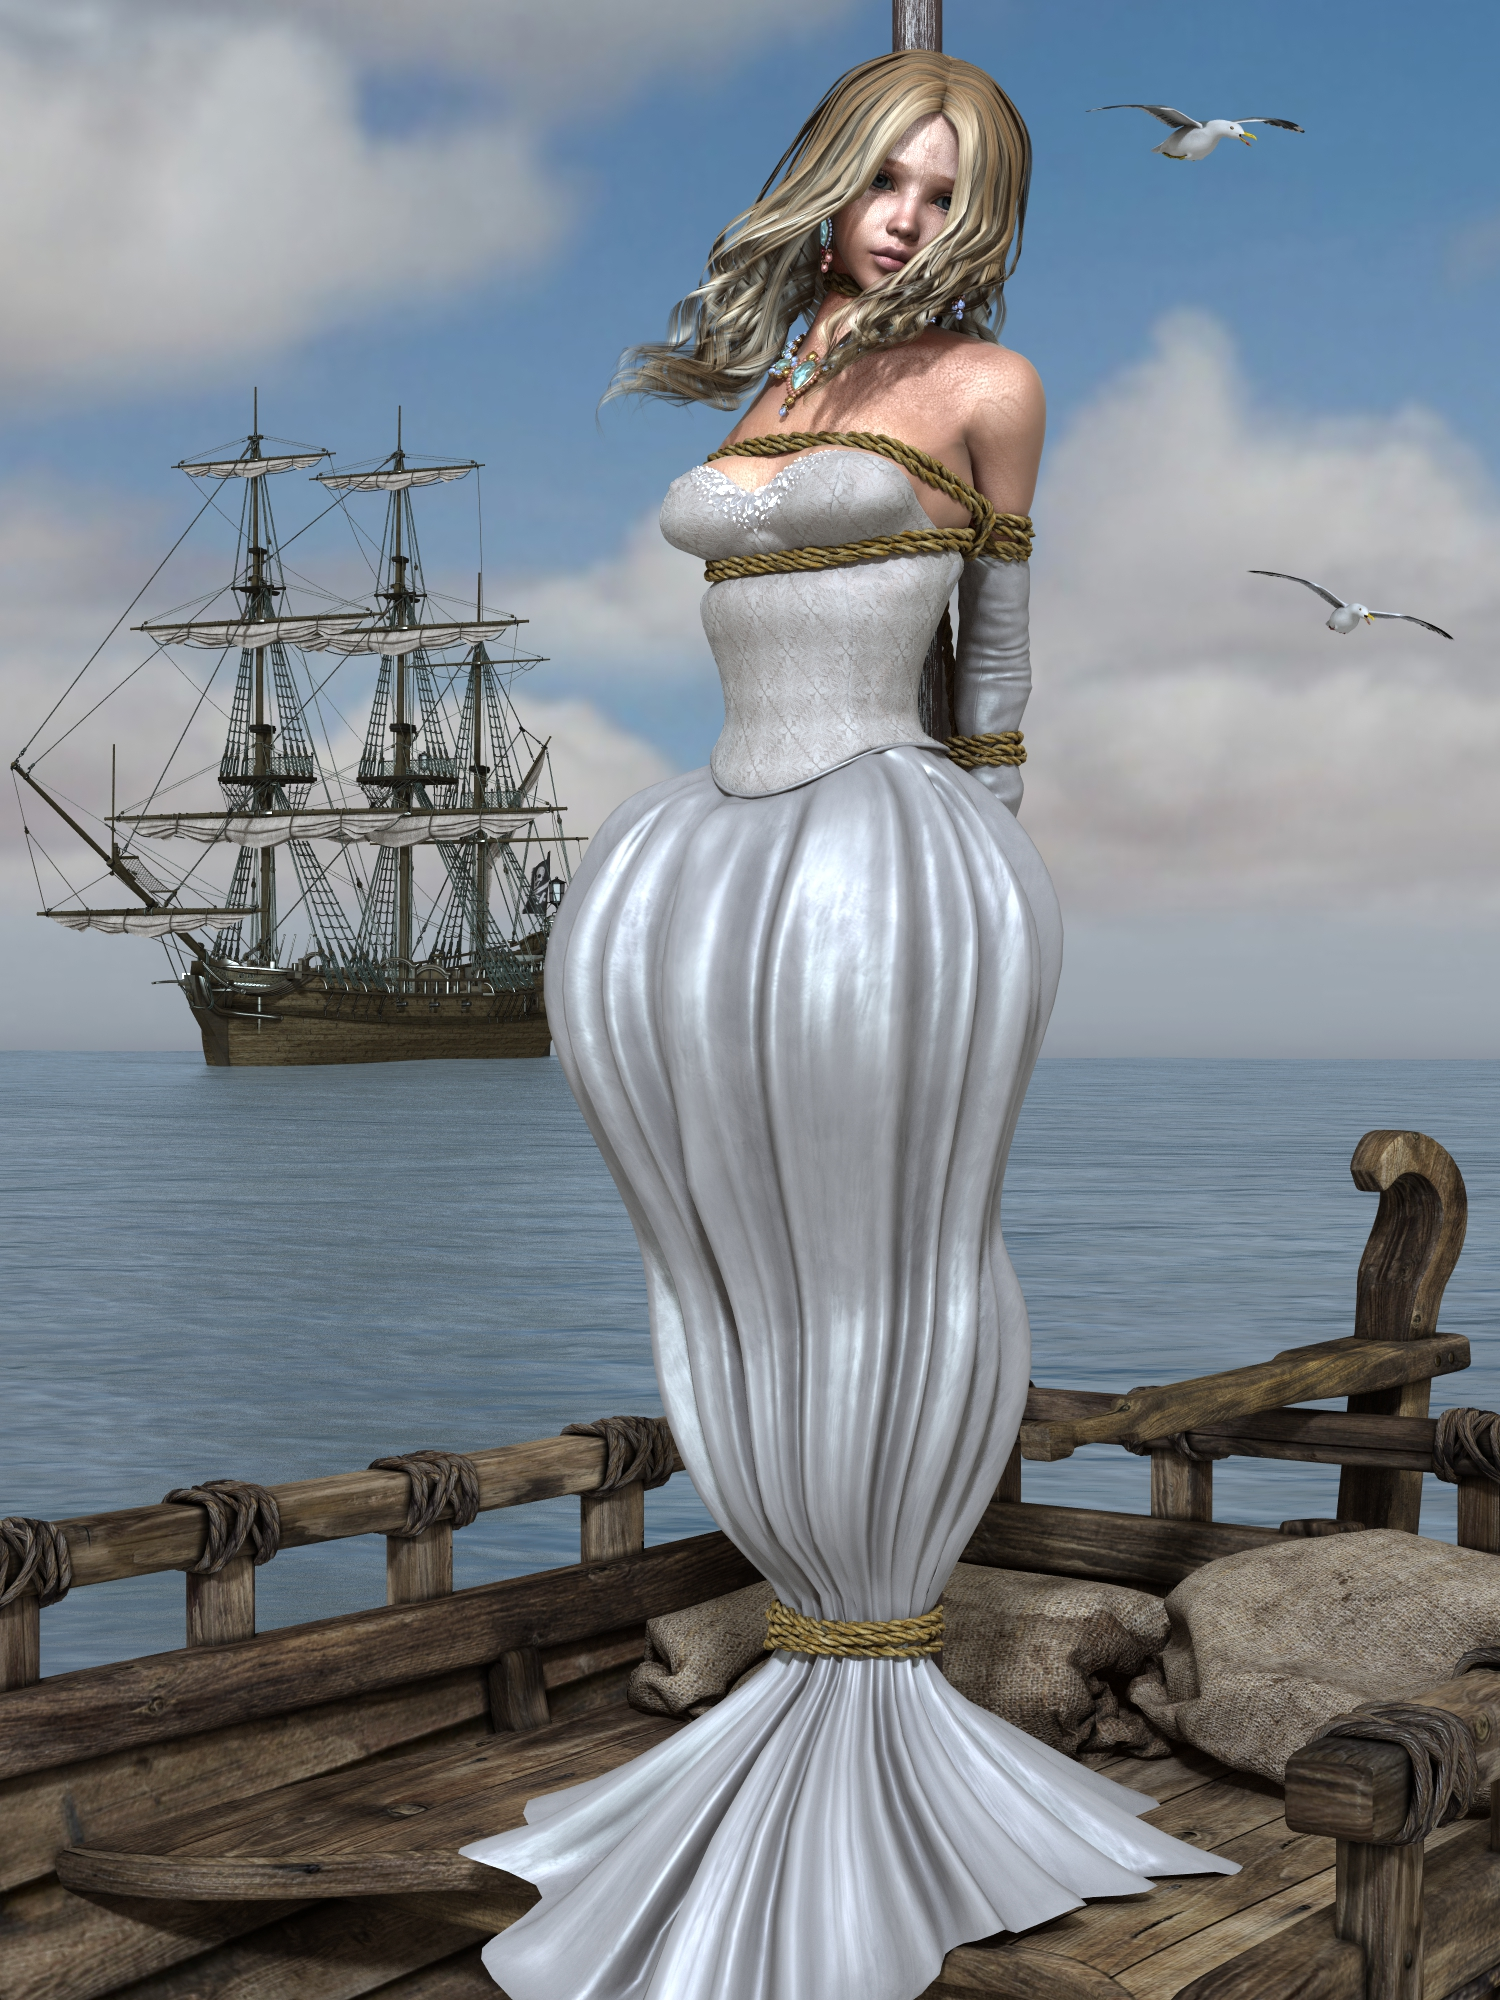 Pirate's Booty 3 by NoBuNoBuNoBuNoBu